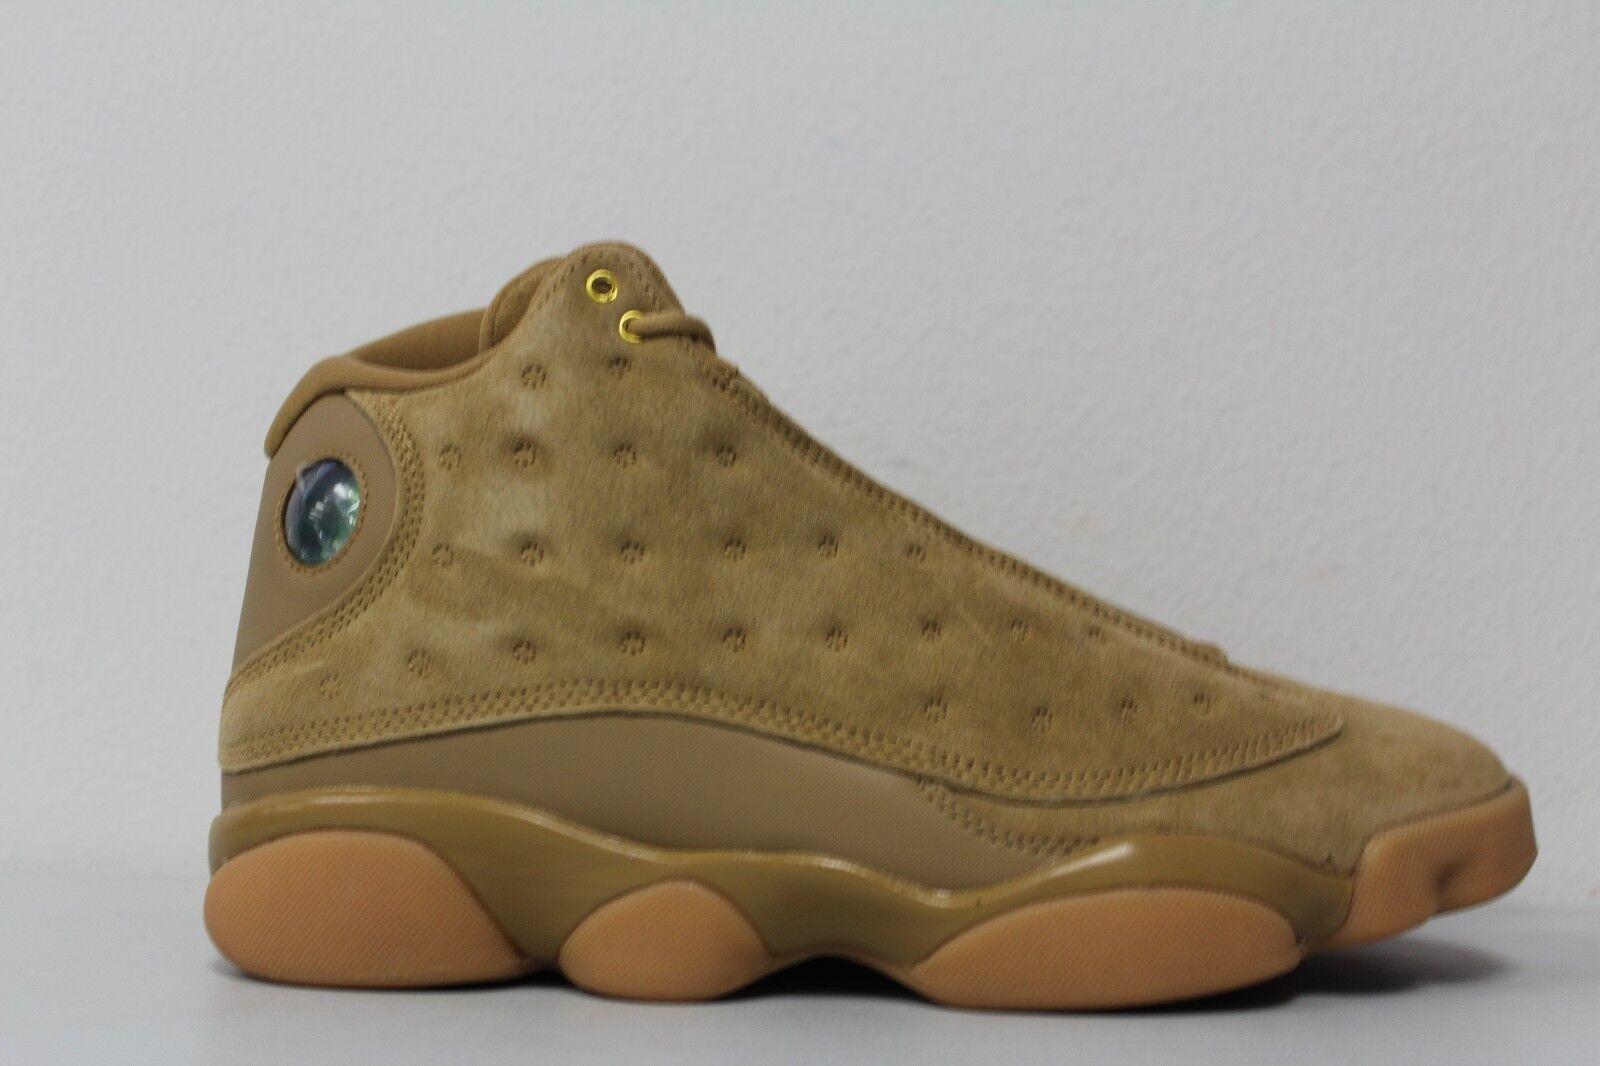 Air Jordan 13 Retro Wheat stores XIII AJ13 get men sneakers Lowest price NEW gold brown 414571-705